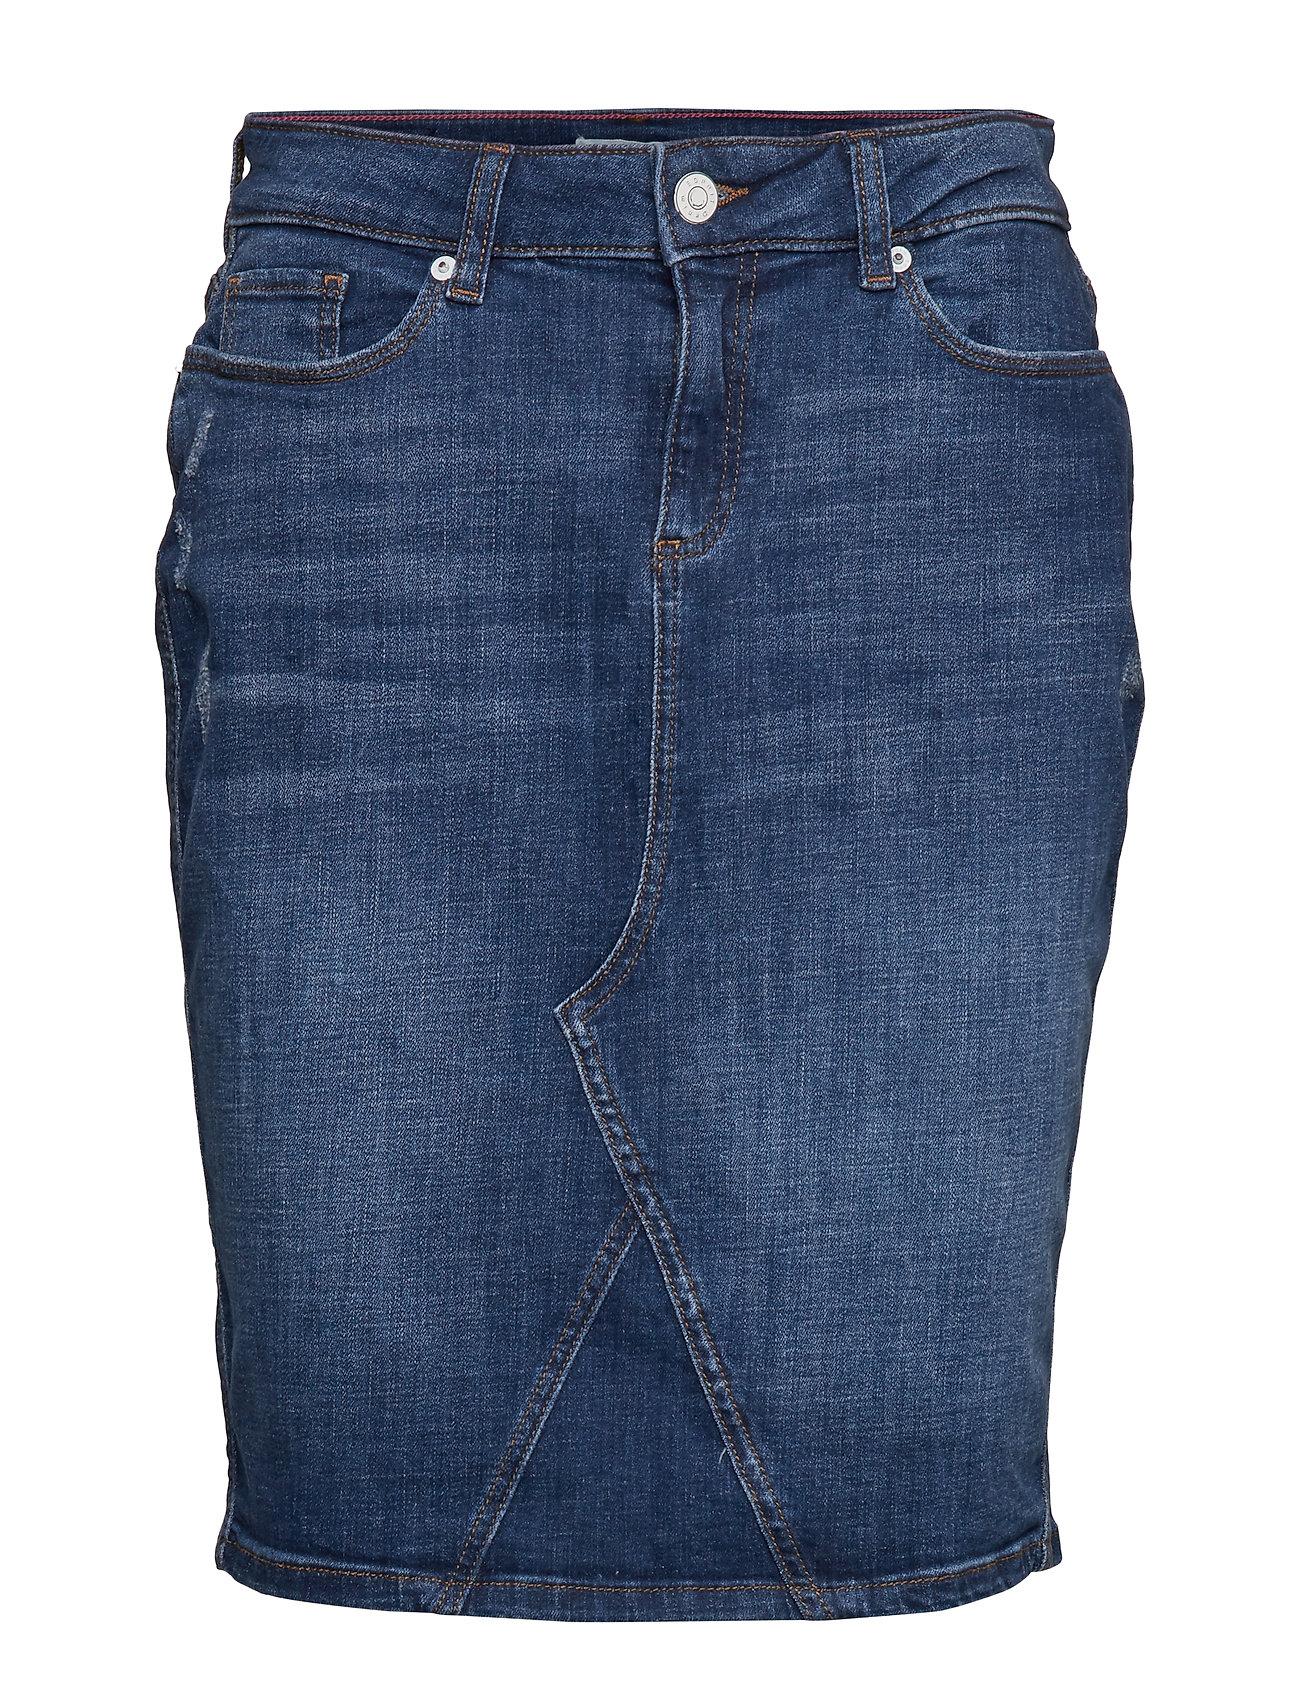 Esprit Casual Skirts denim - BLUE MEDIUM WASH